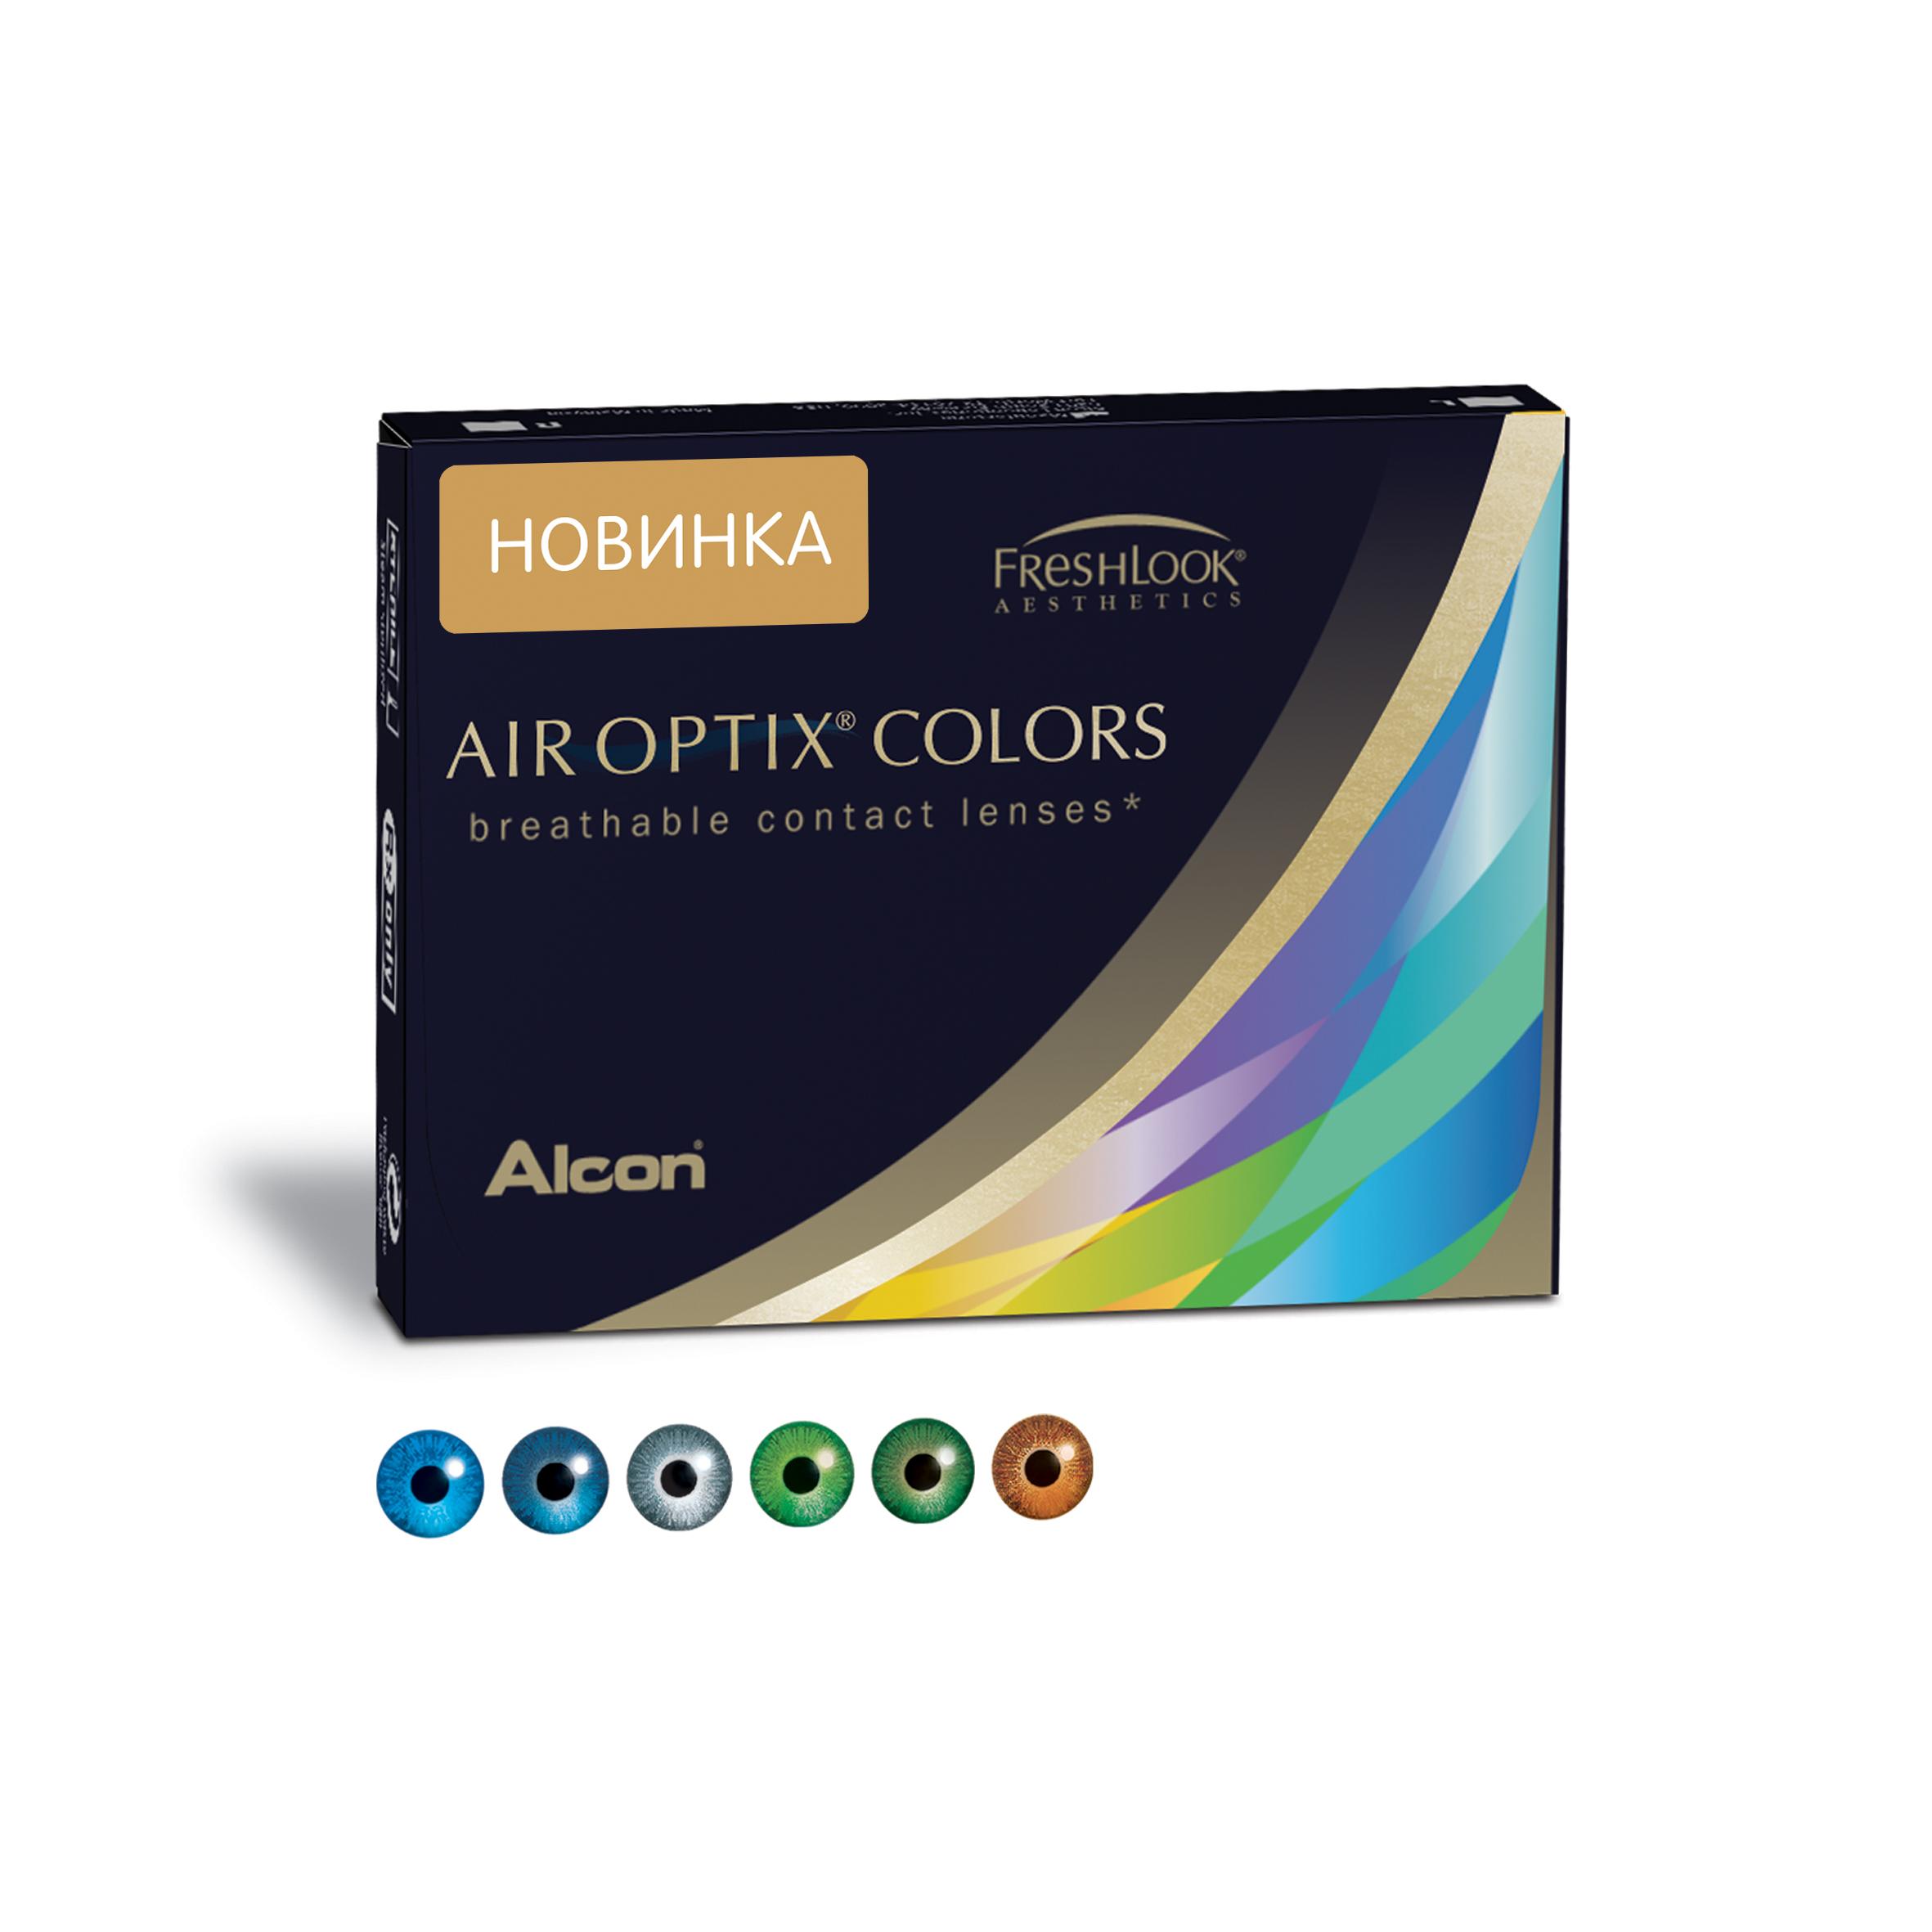 Аlcon контактные линзы Air Optix Colors 2 шт -4.00 Honey31746235Мягкие контактные линзы